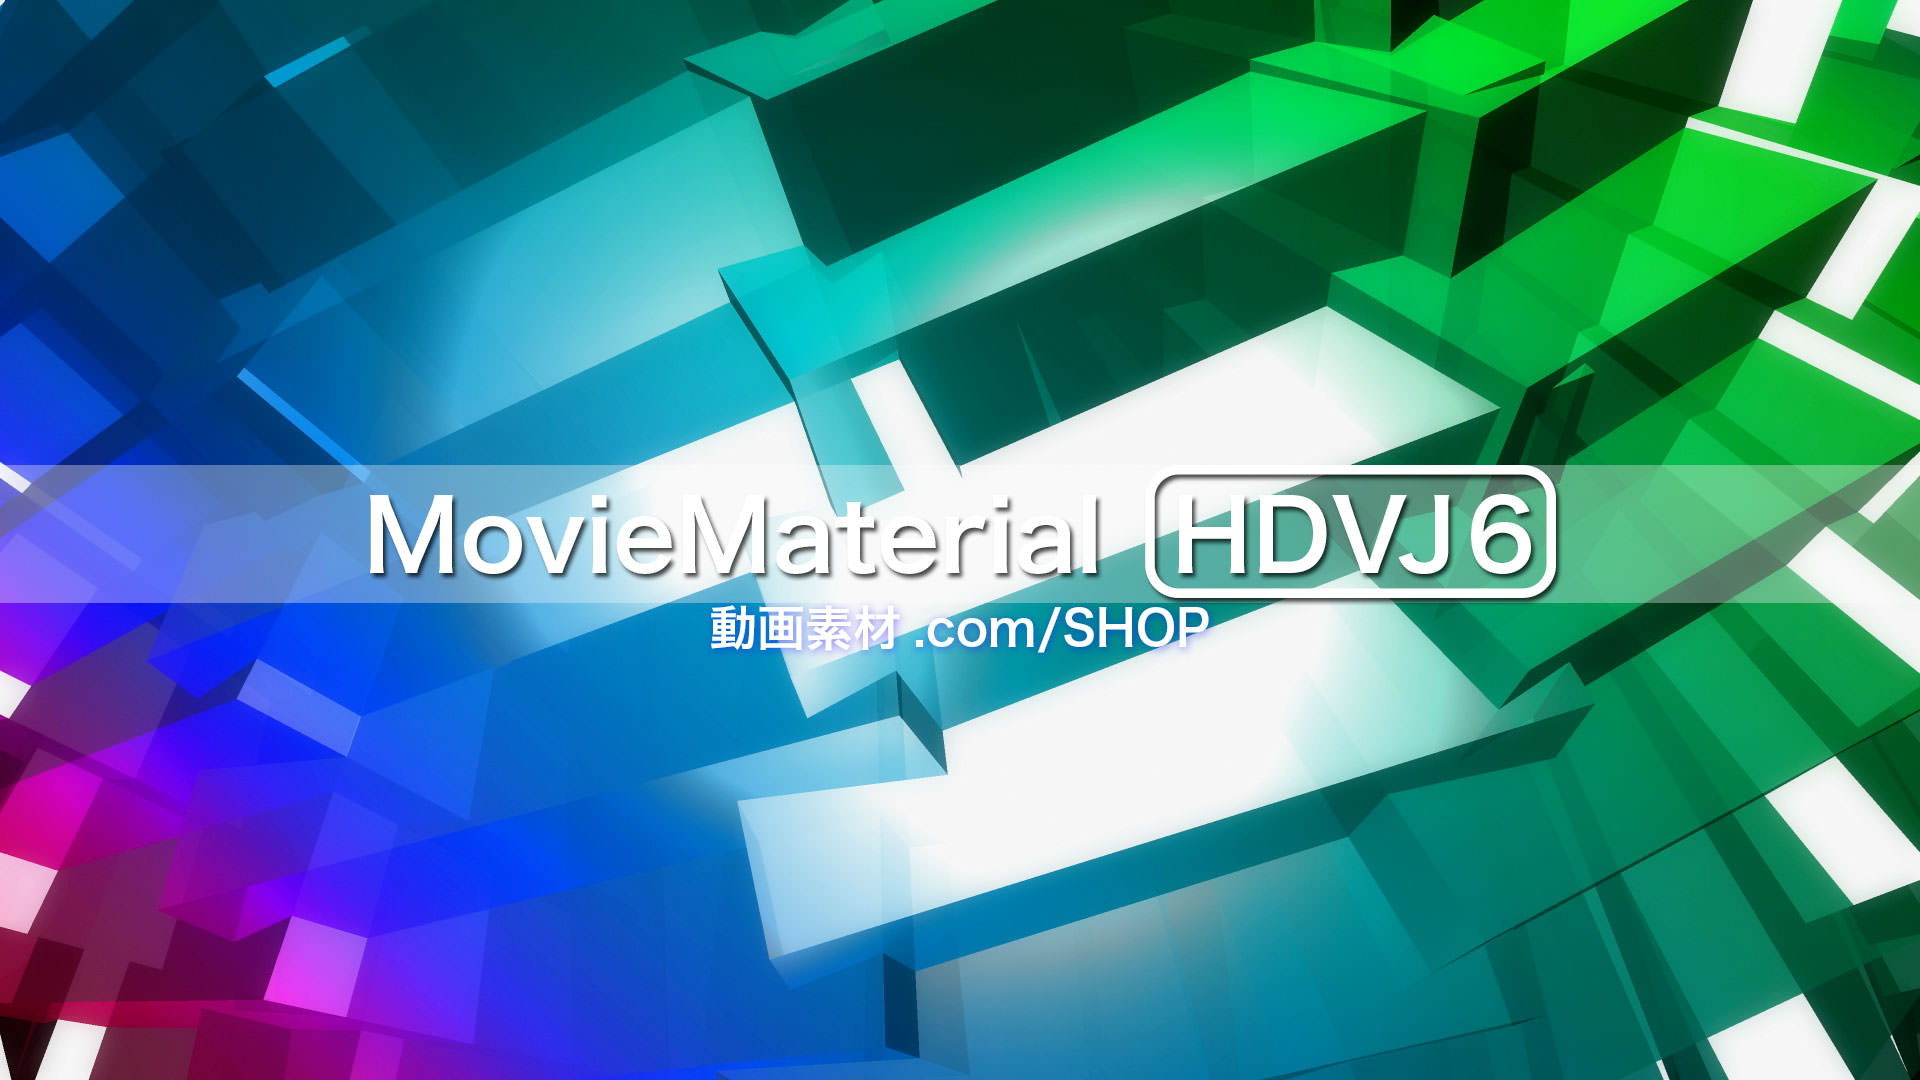 MovieMaterial HDVJ6 フルハイビジョンVJ動画素材集 画像3